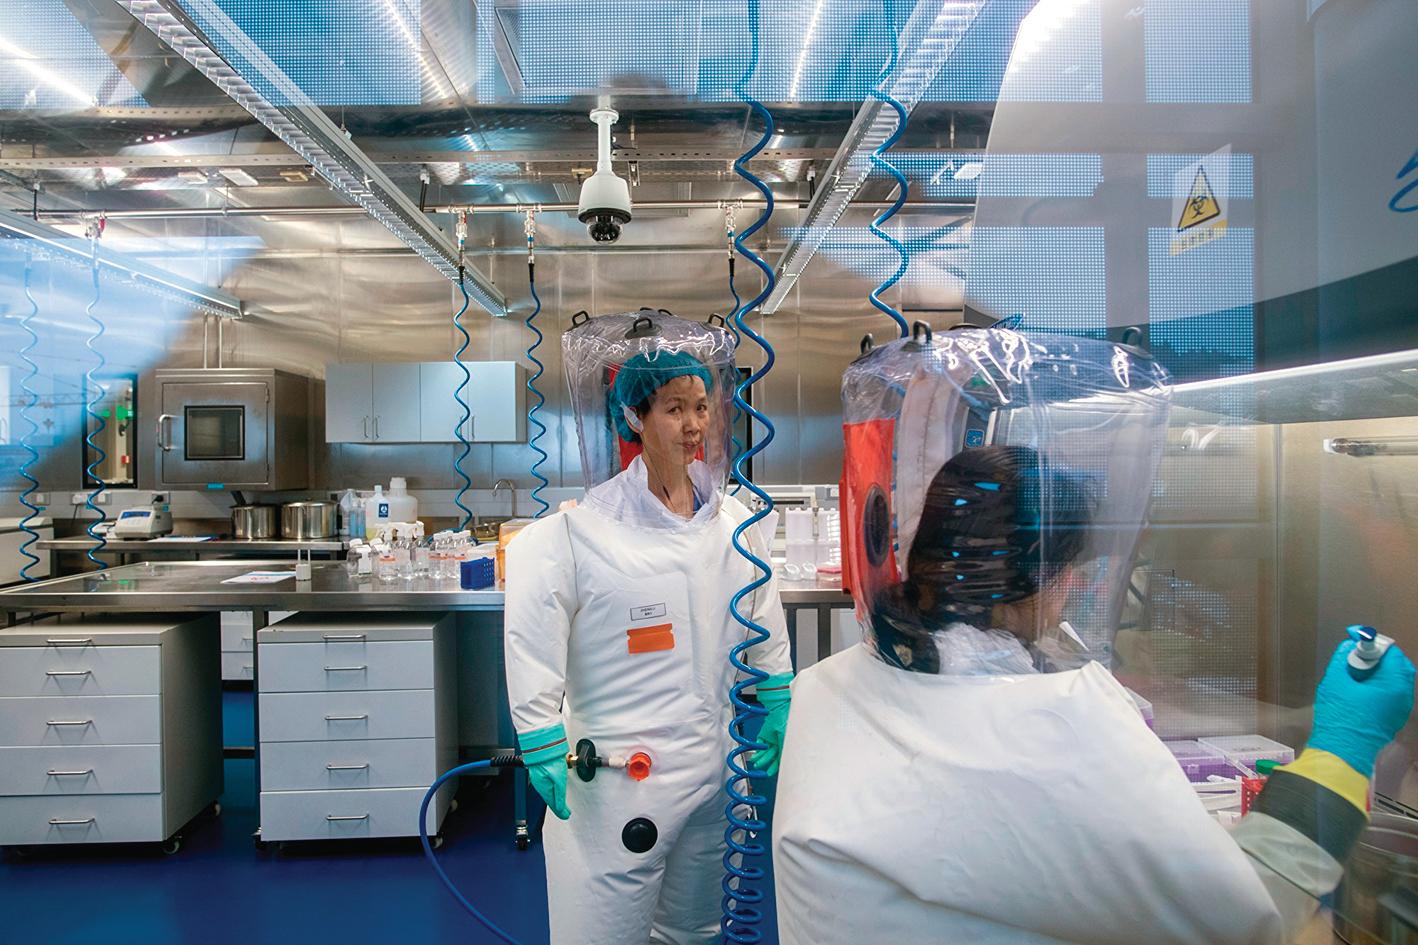 武漢P4實驗室。(Getty Images)